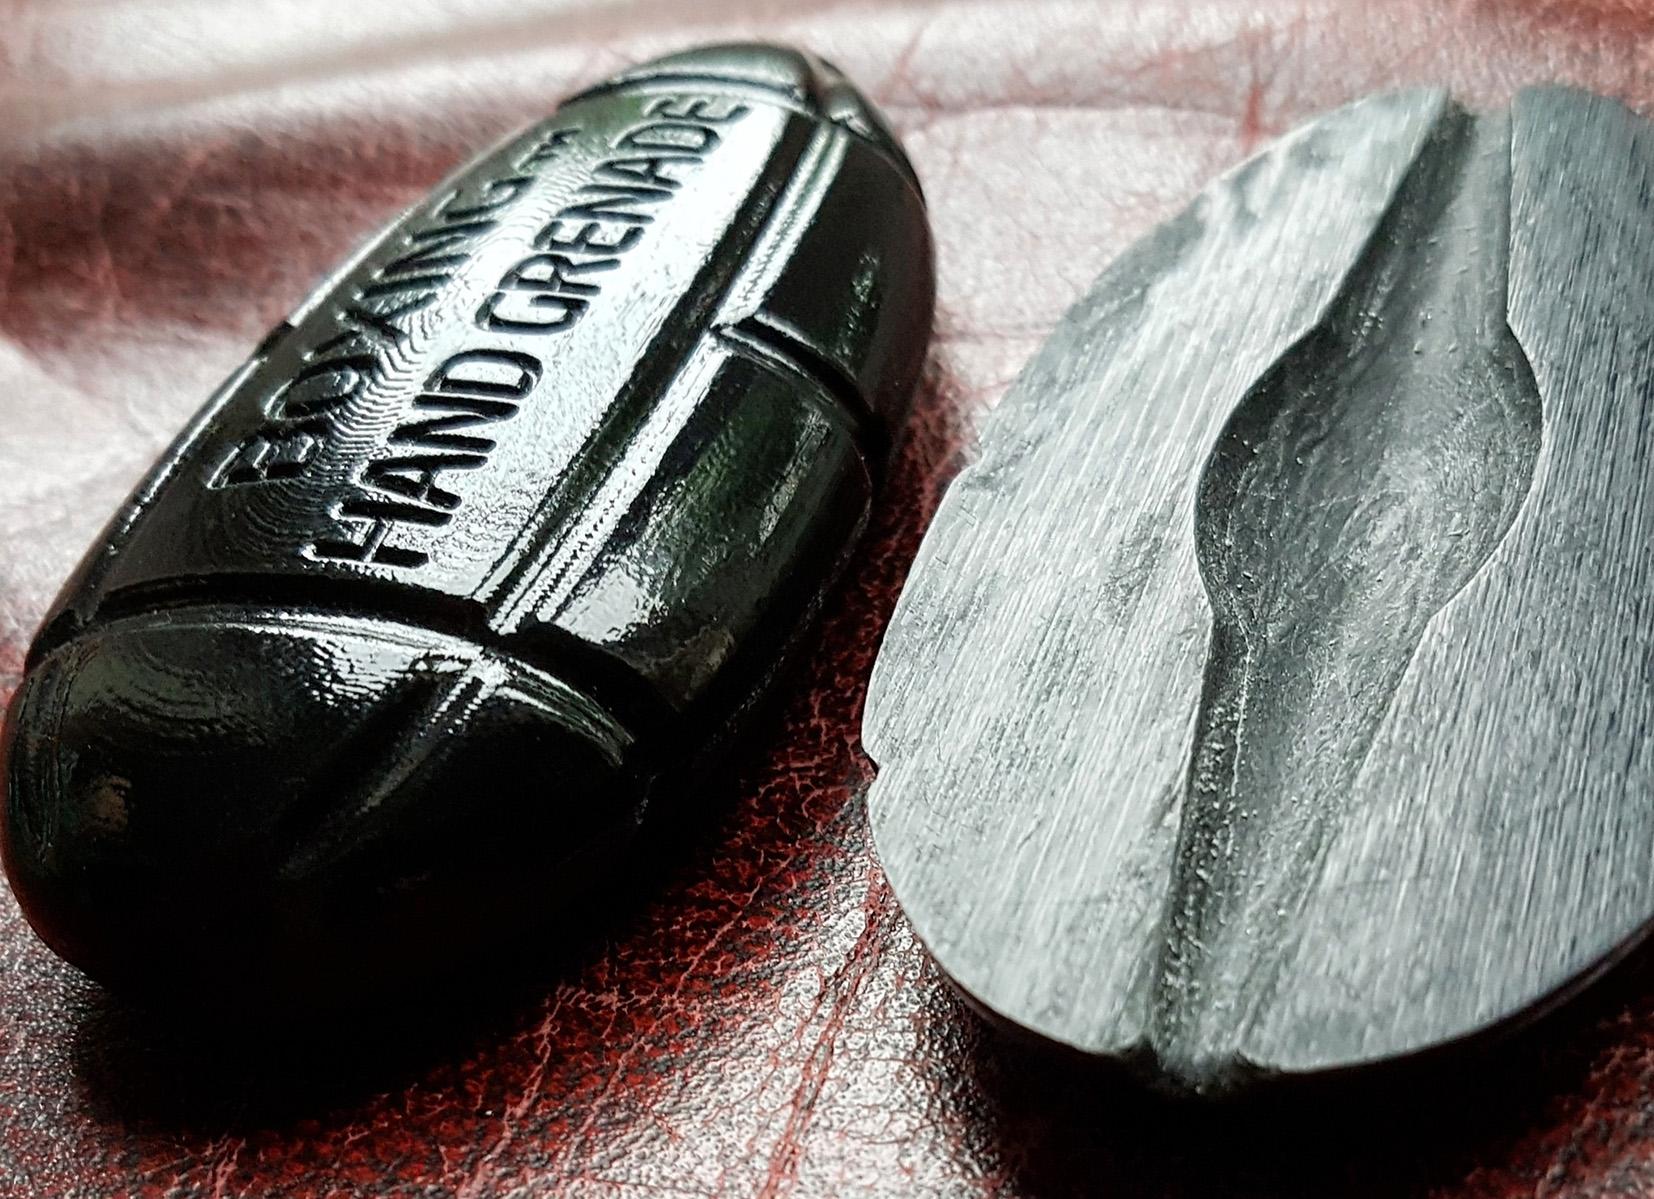 The Boxing Hand Grenade. Photo via Protolabs.